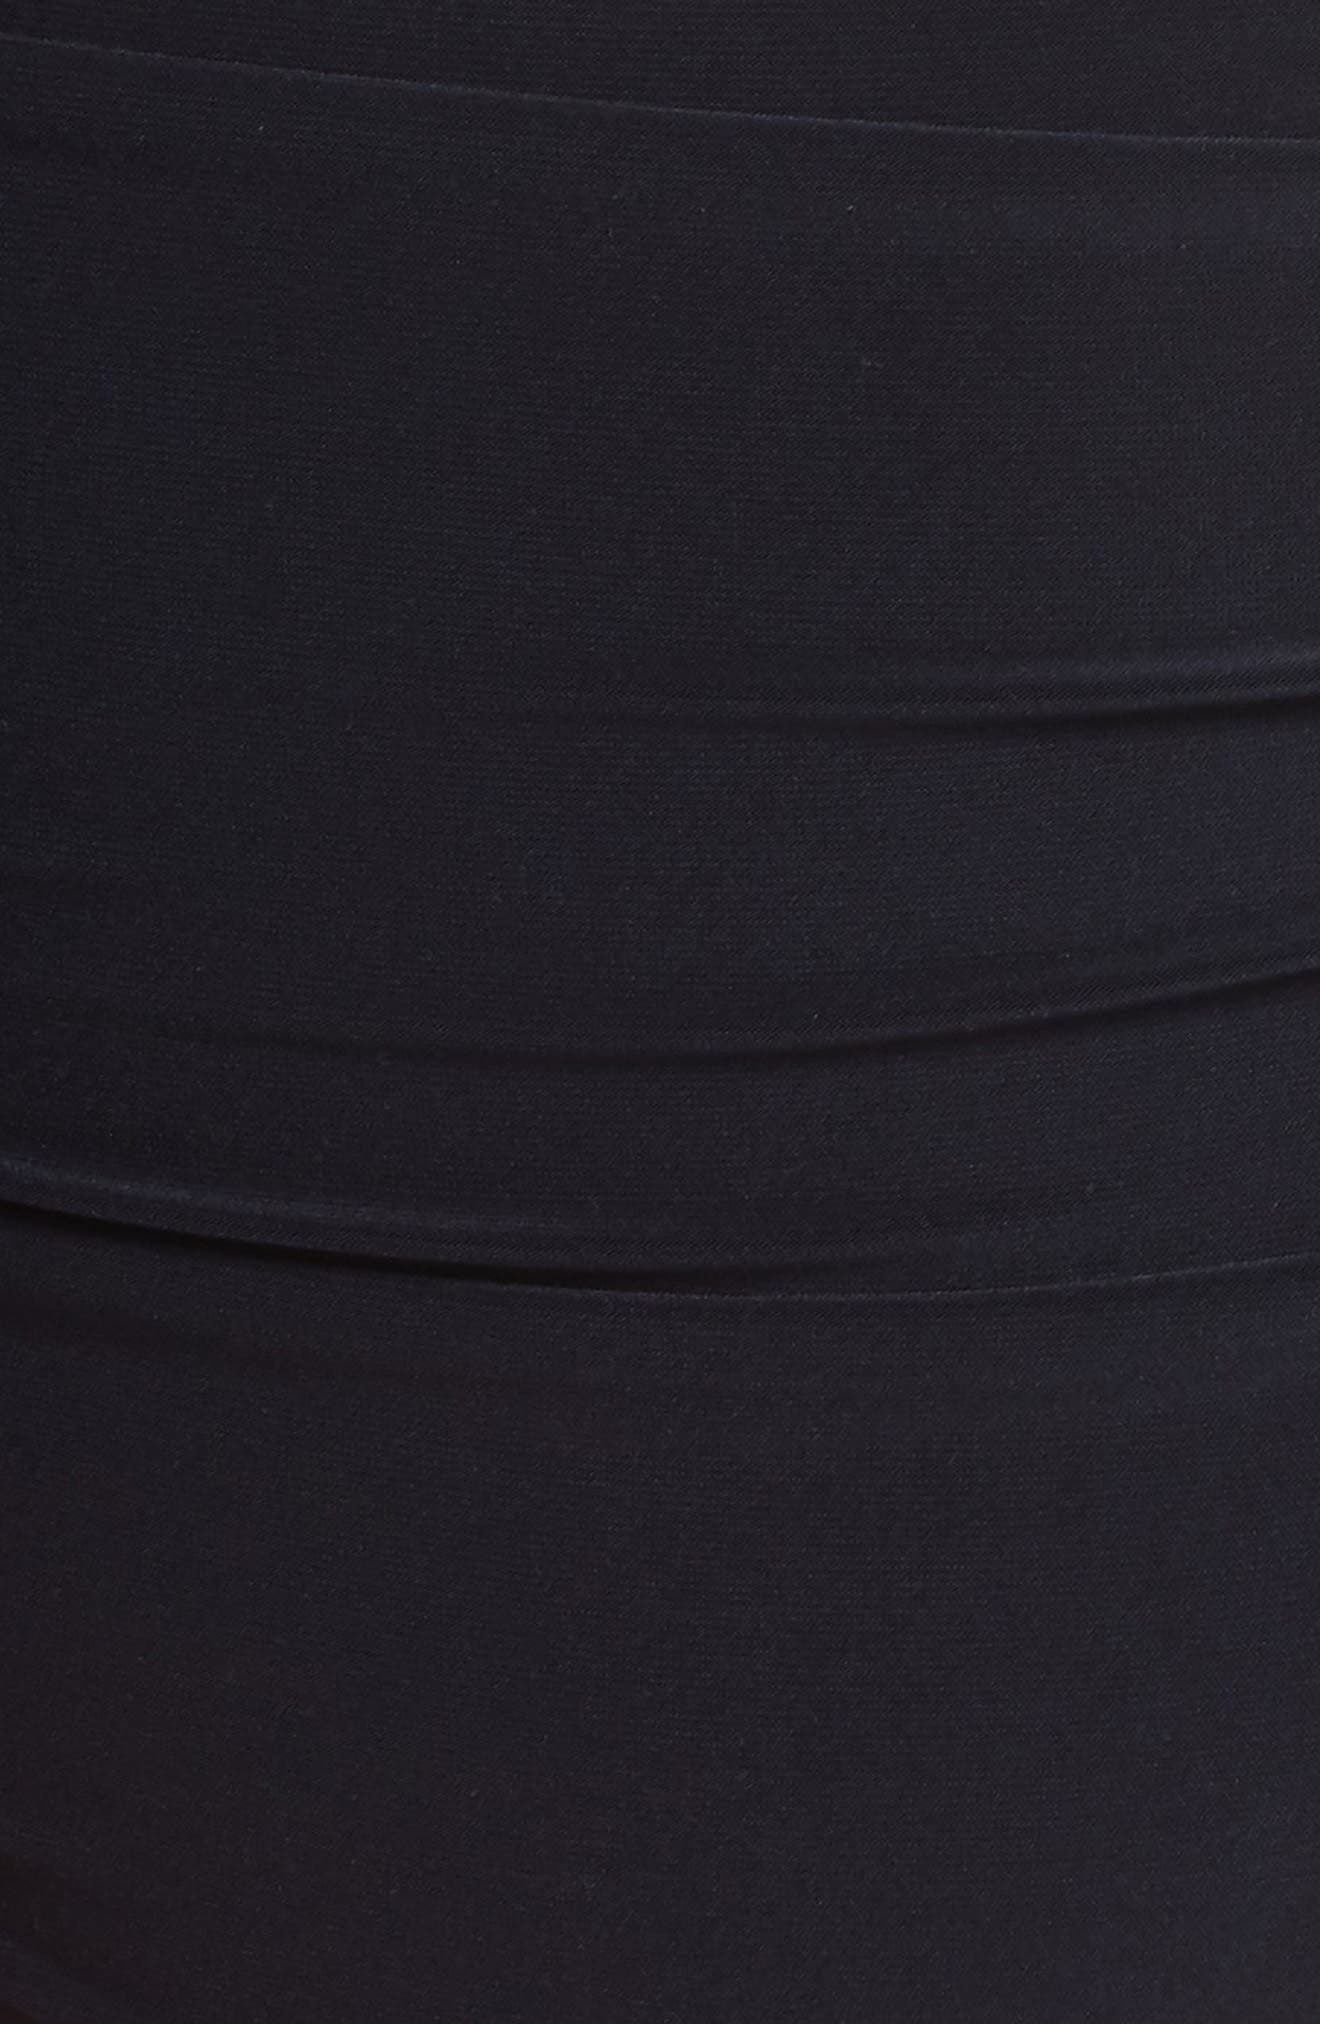 Ruched Bikini Bottoms,                             Alternate thumbnail 5, color,                             BLACK